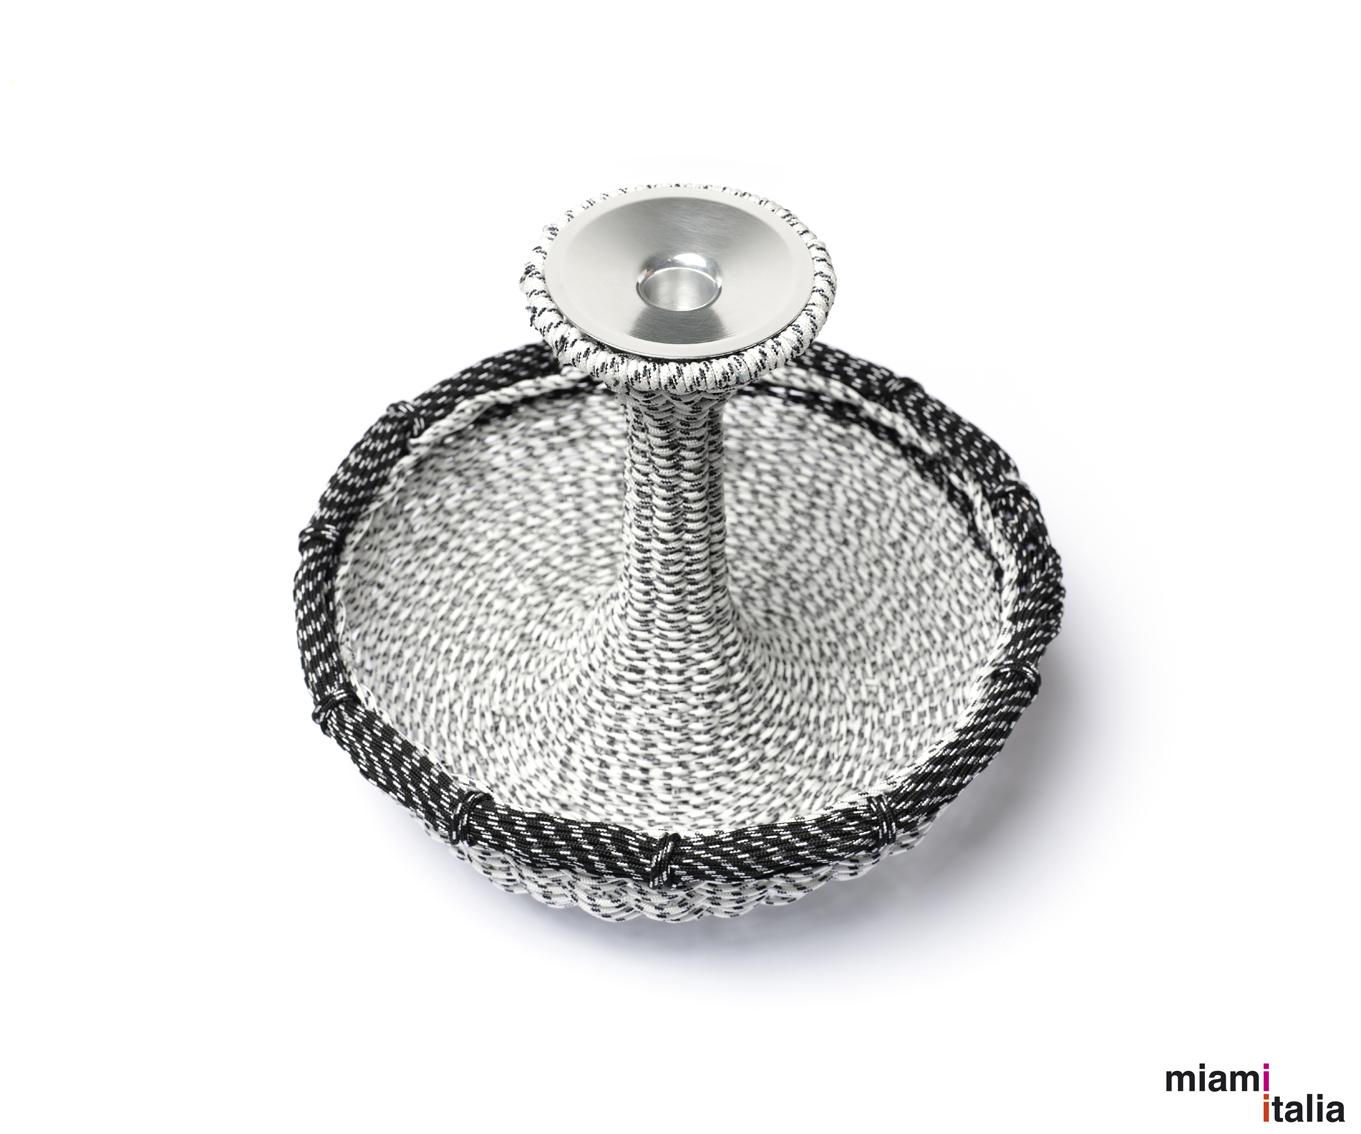 MIAMI, ITALIA_basket centerpiece Miriam Mirri